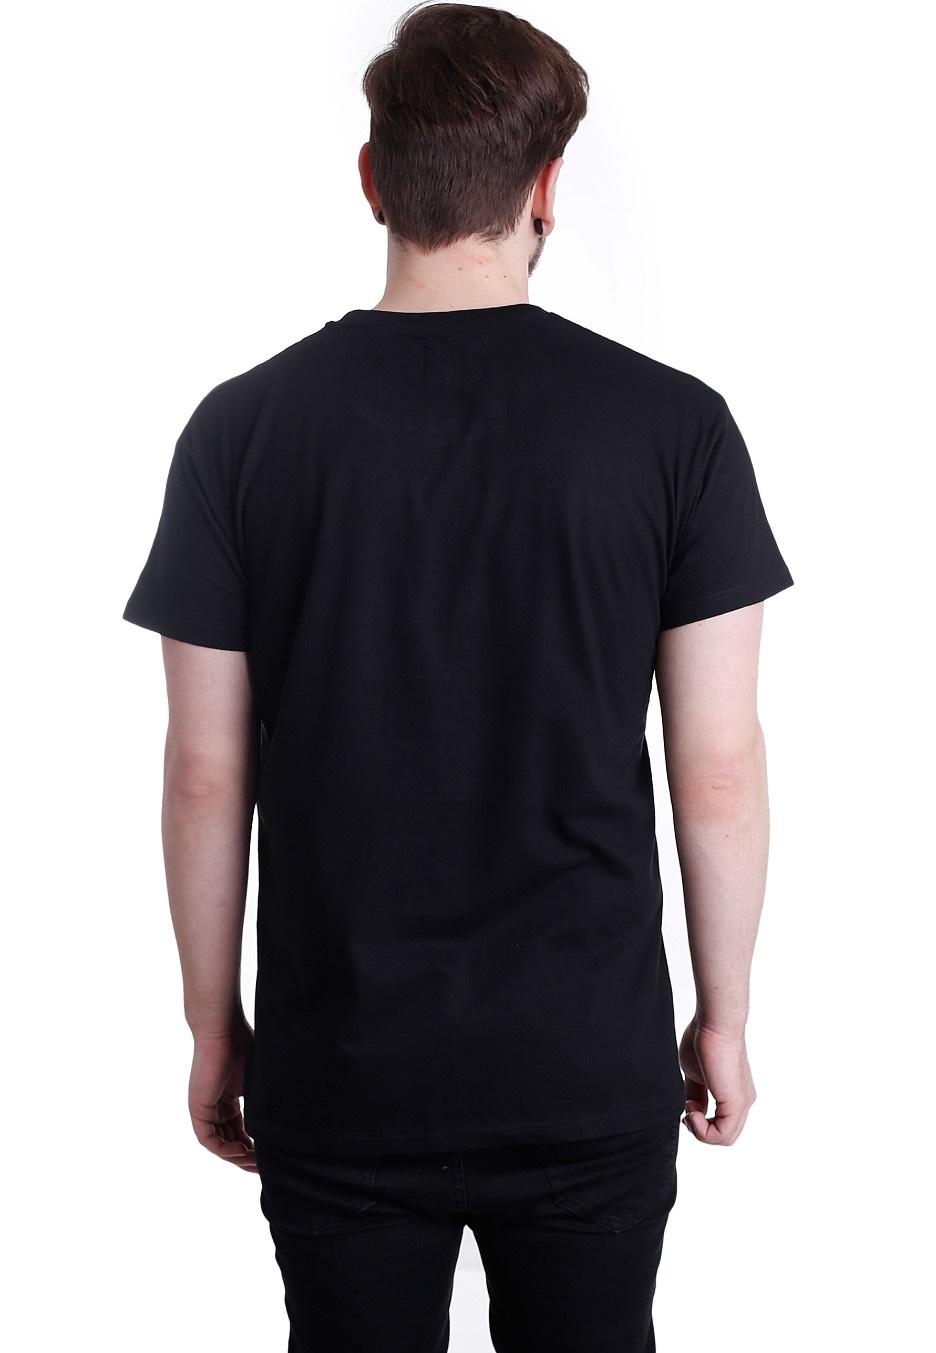 chelsea grin coin t shirt official deathcore merchandise shop worldwide. Black Bedroom Furniture Sets. Home Design Ideas